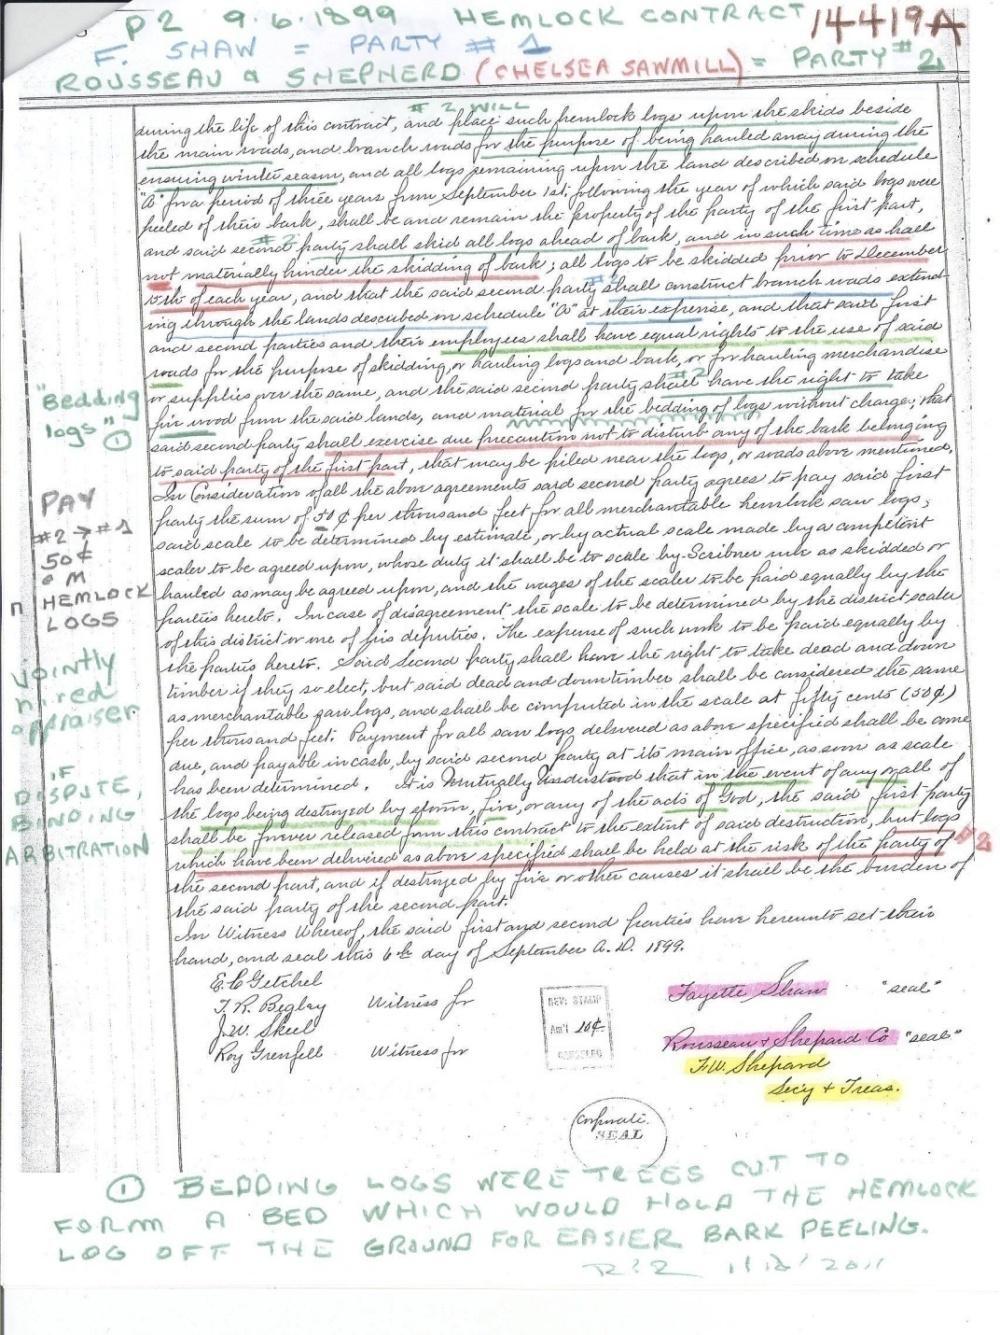 C:\Users\Robert P. Rusch\Desktop\II. RLHSoc\Documents & Photos-Scanned\Rib Lake History 14400-14499\14419A-F.W. Shephard-secretary & treasurer signs for Rousseau & Shephard.jpg